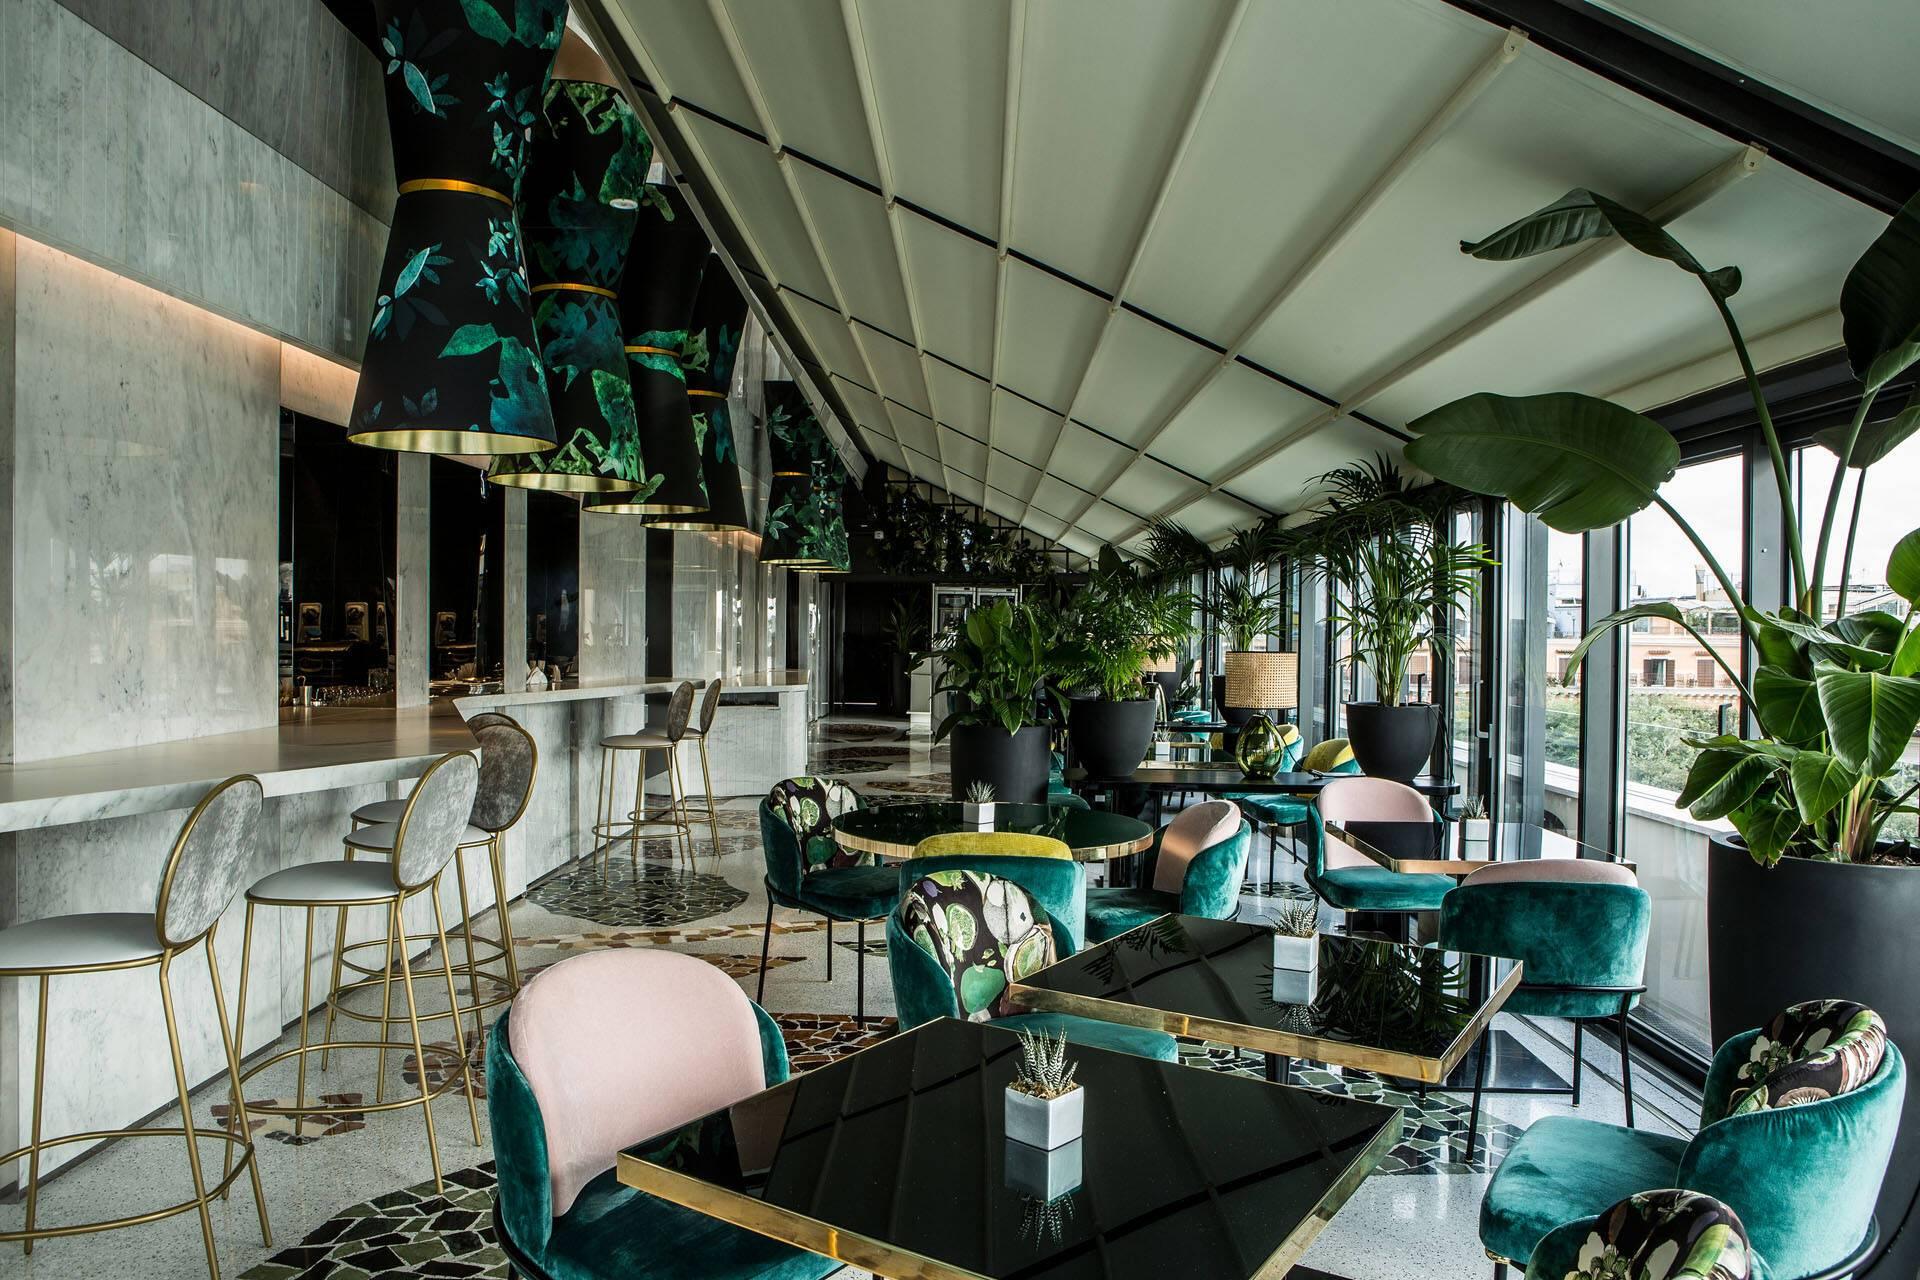 Sofitel Villa Borghese Rome Settimo Restaurant